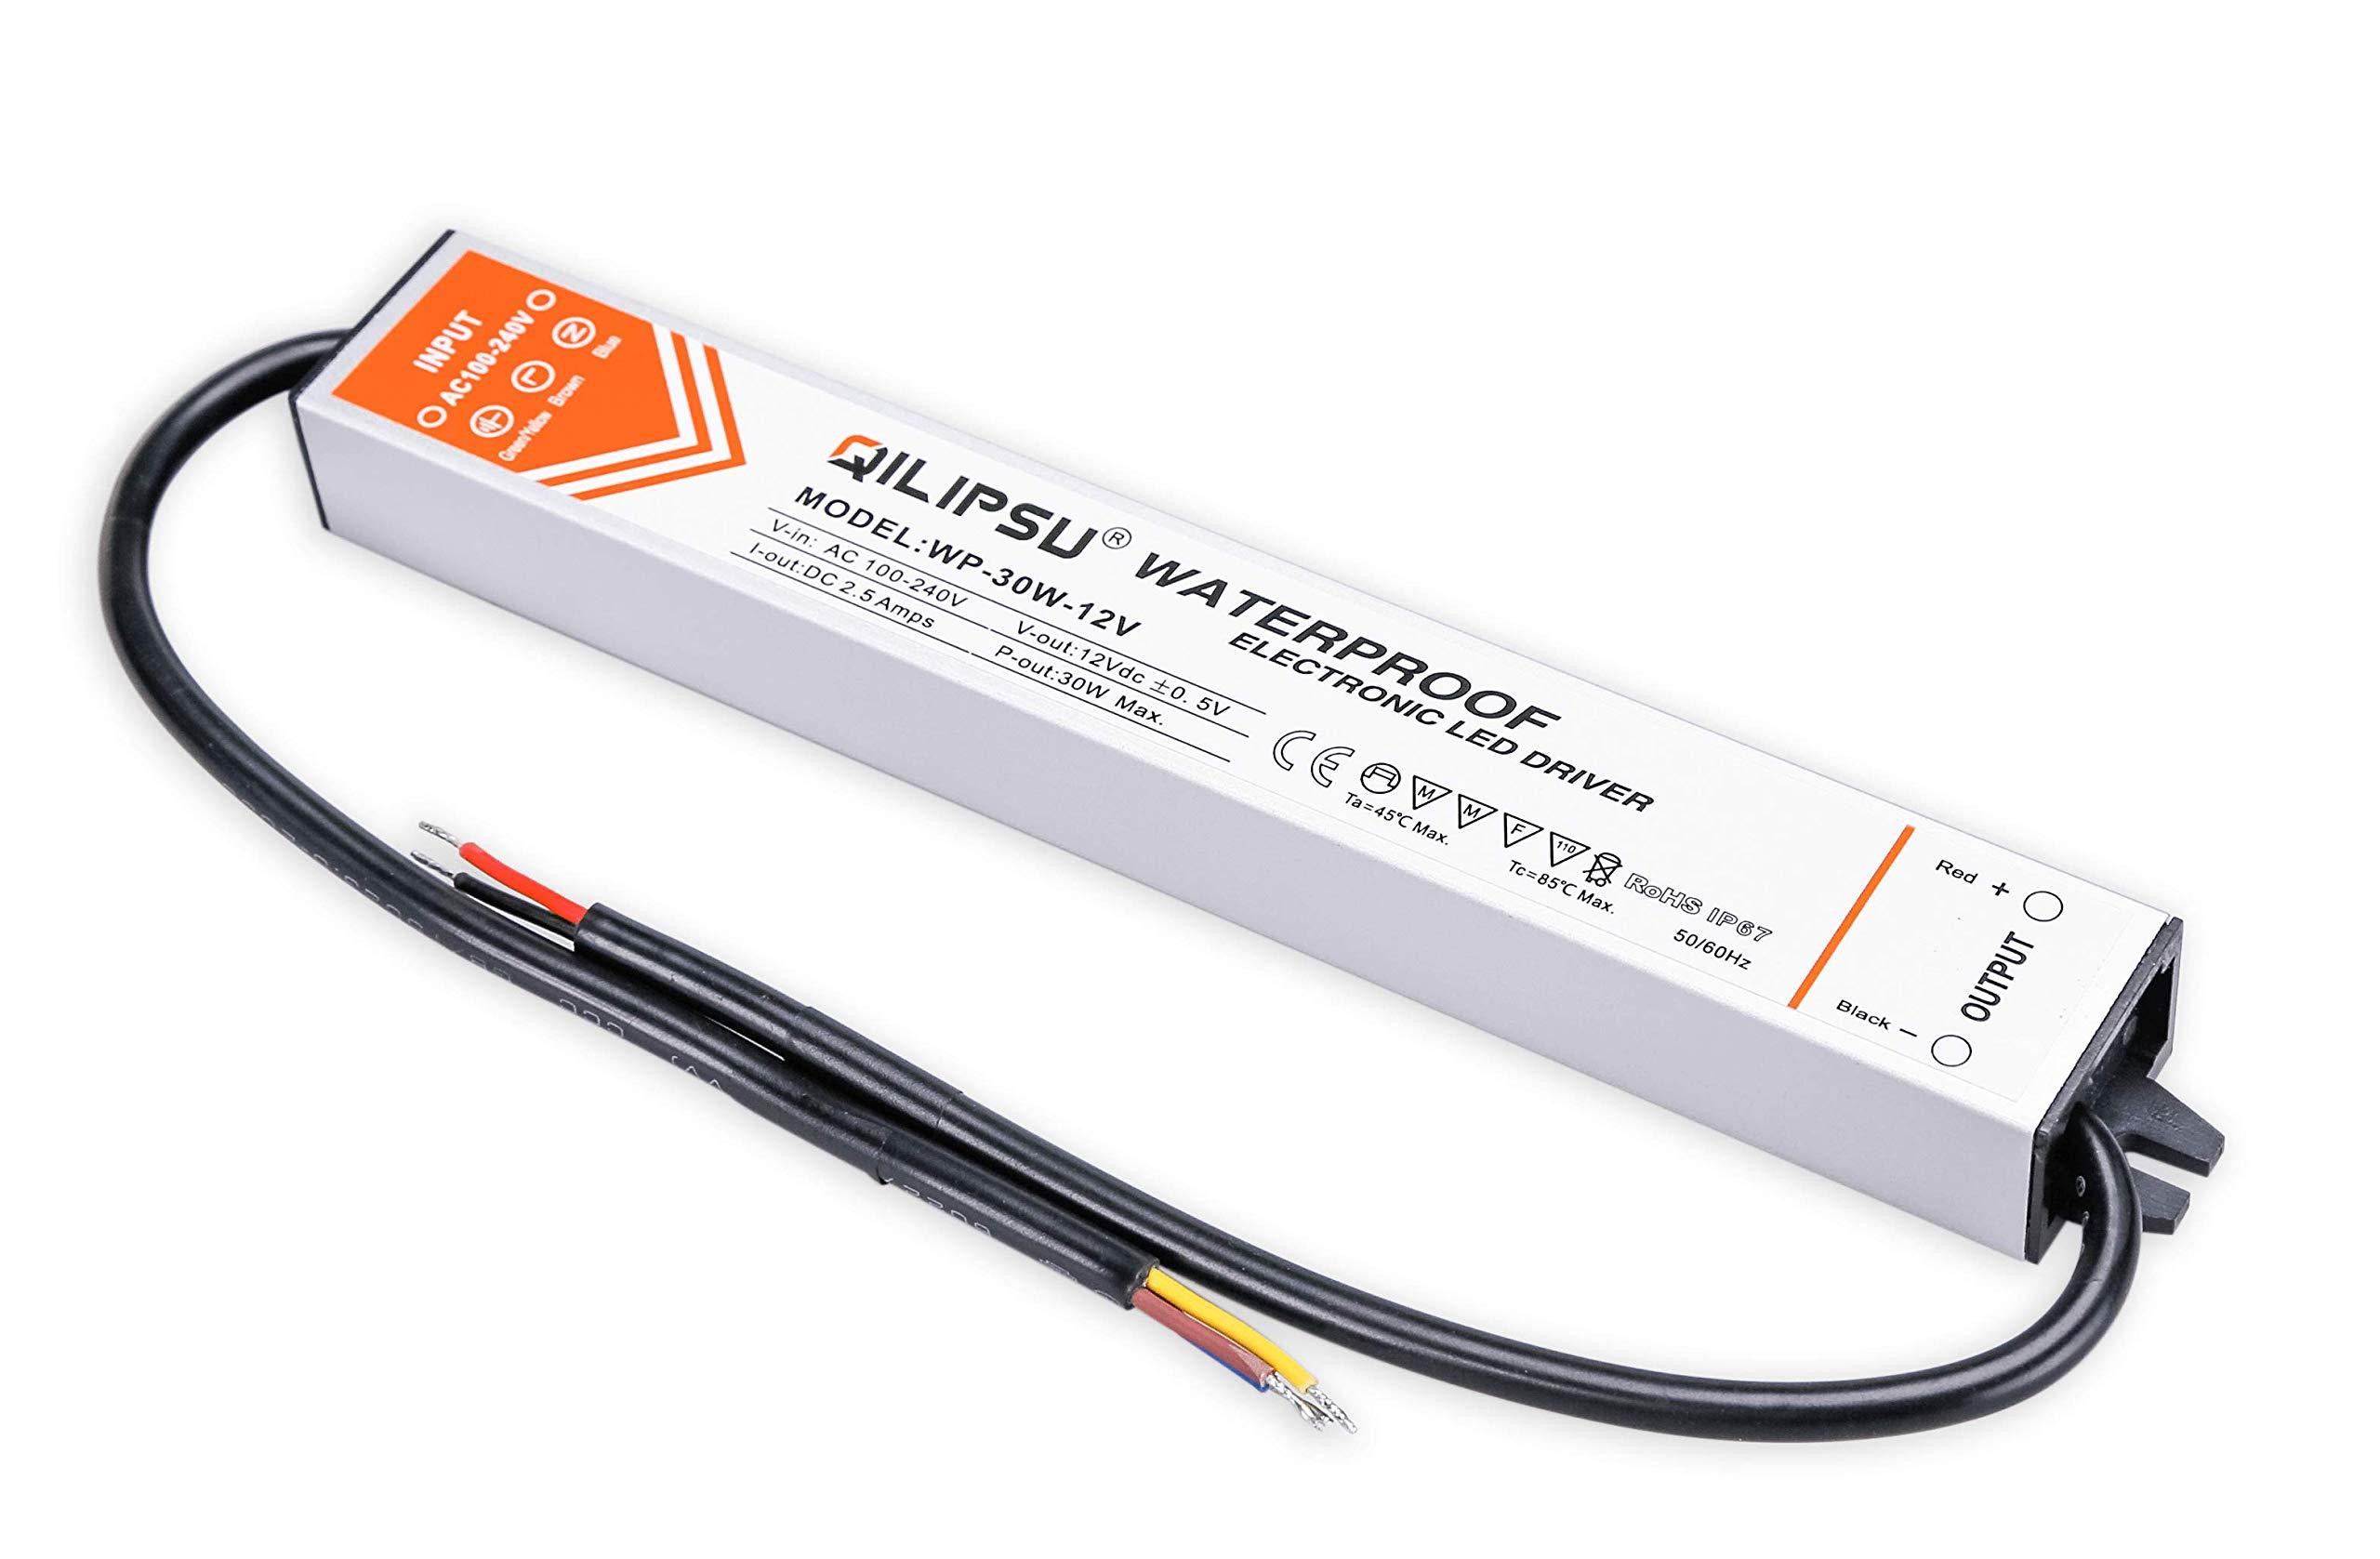 QILIPSU 30W 12V LED Driver IP67 Waterproof LED Power Supply DC Output Transformer (30W)